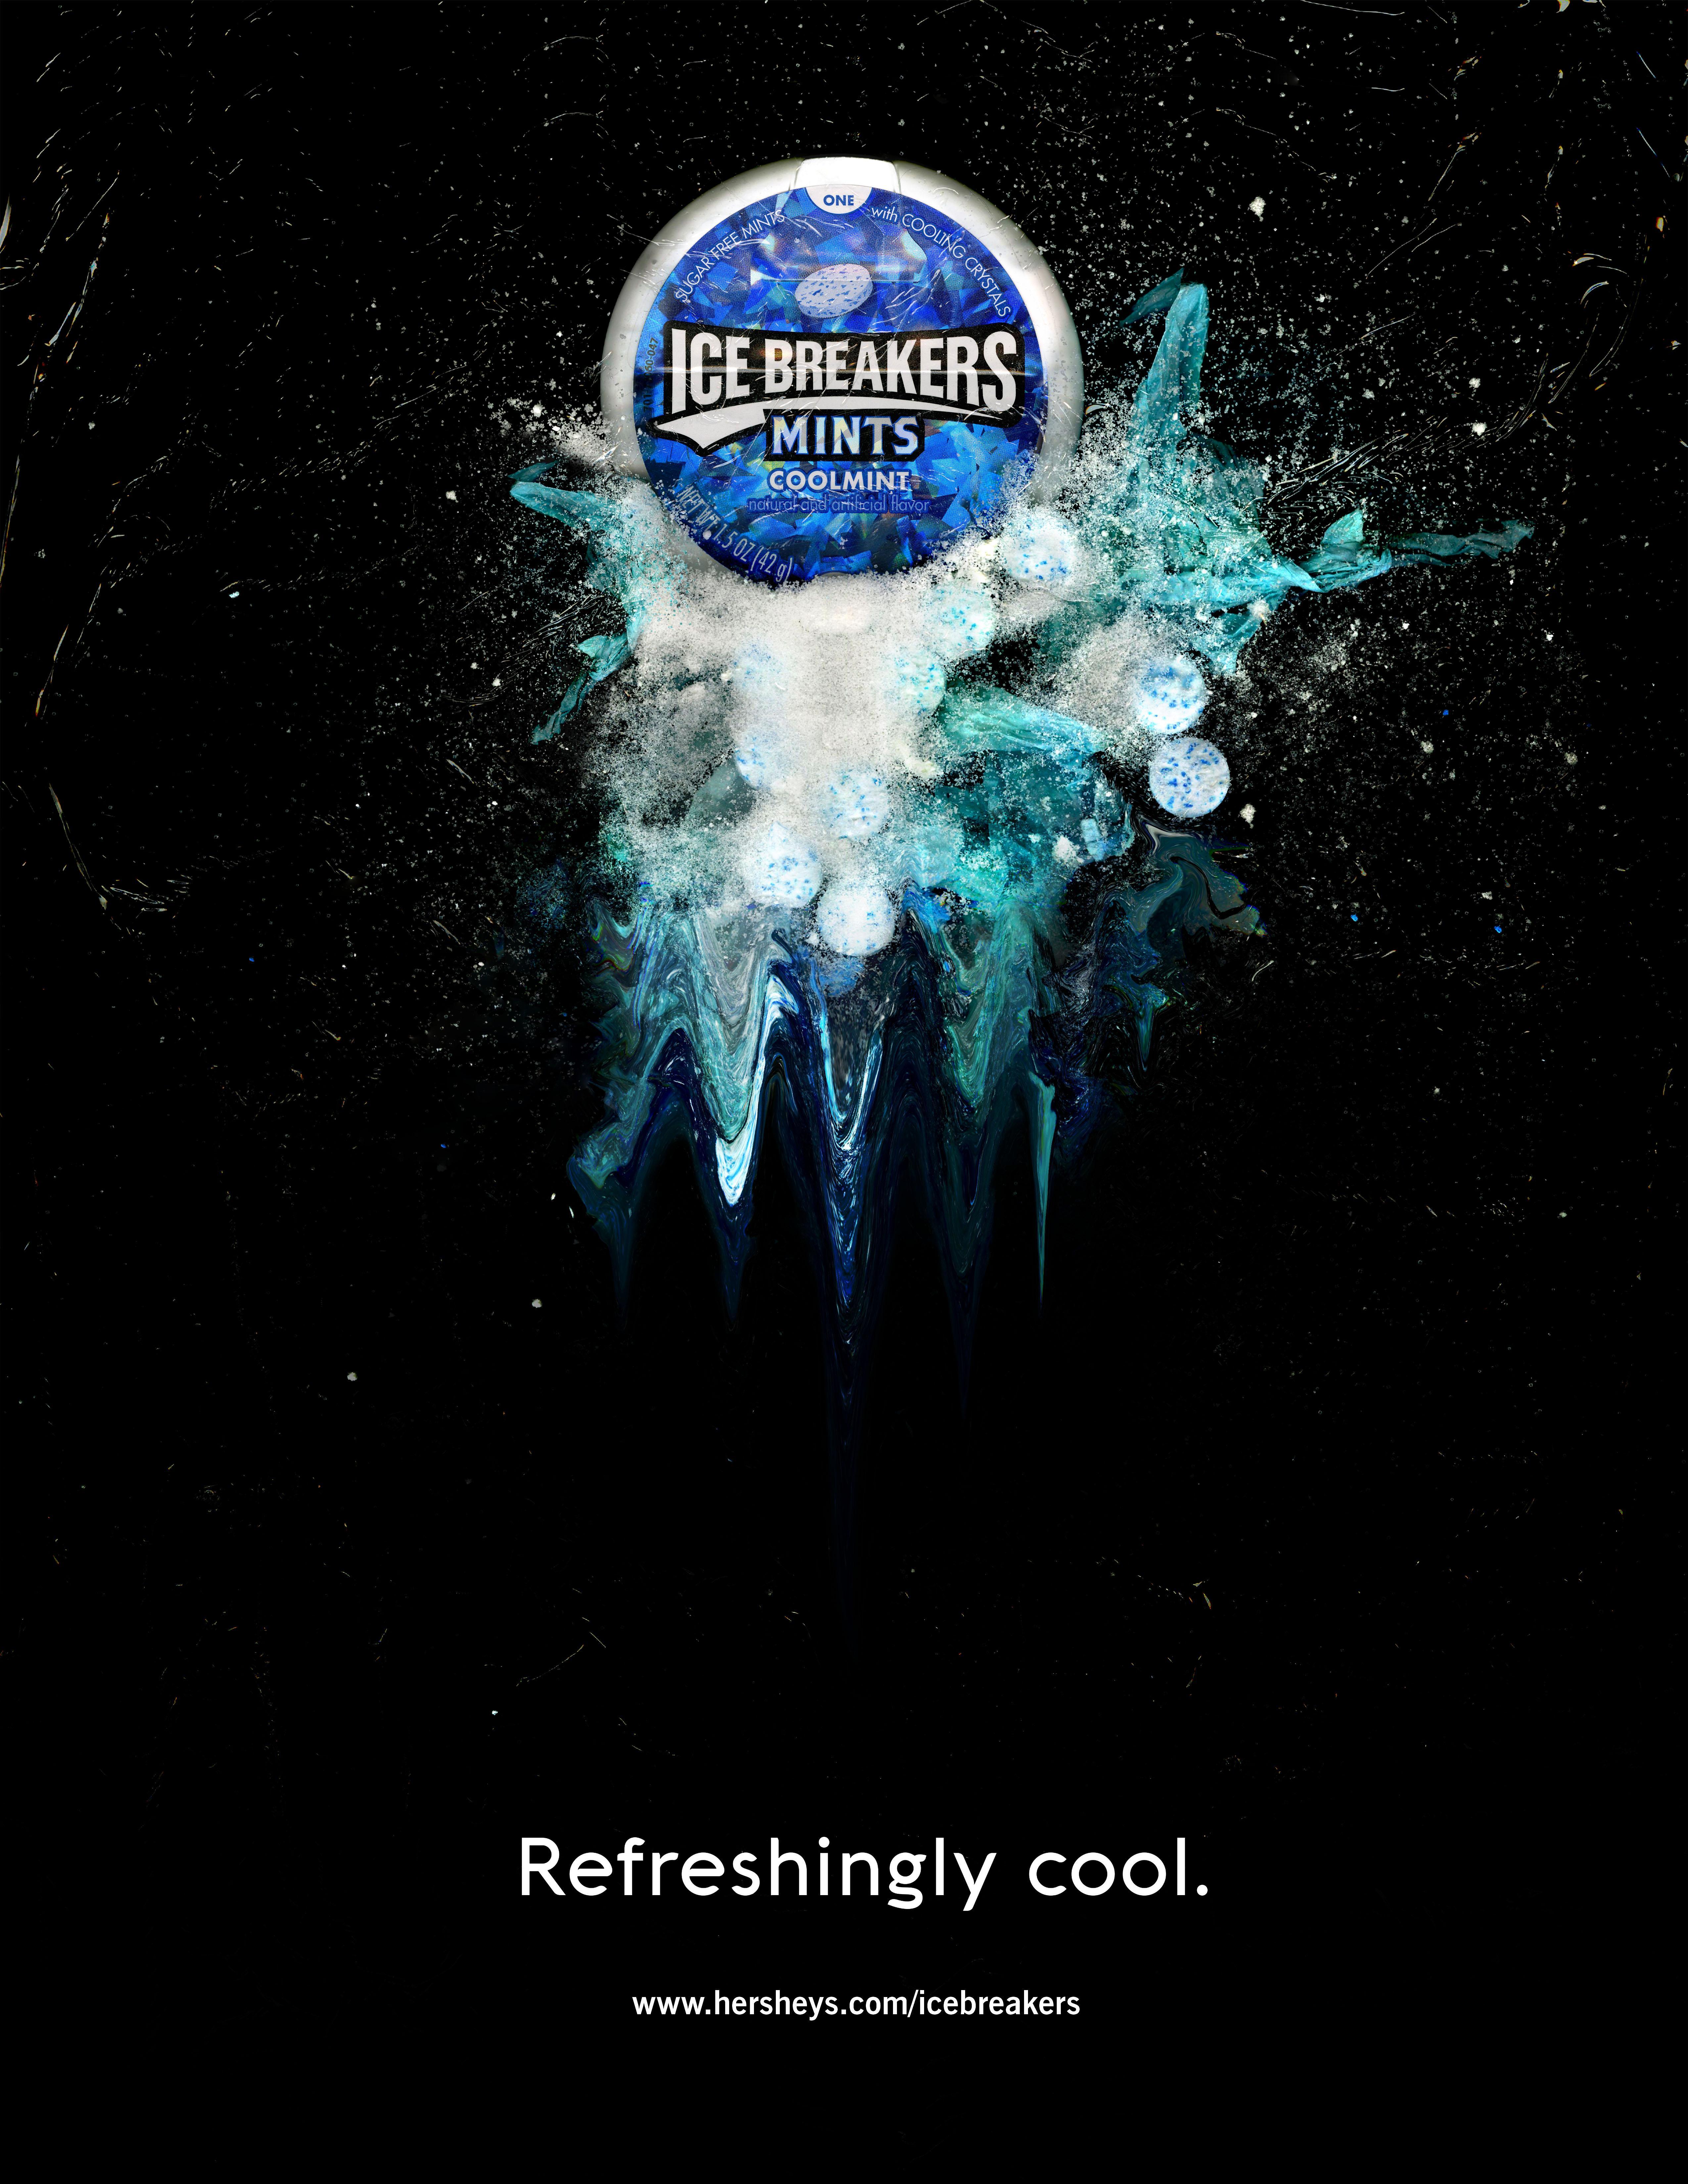 Icebreakers Print Ad - Refreshingly Cool